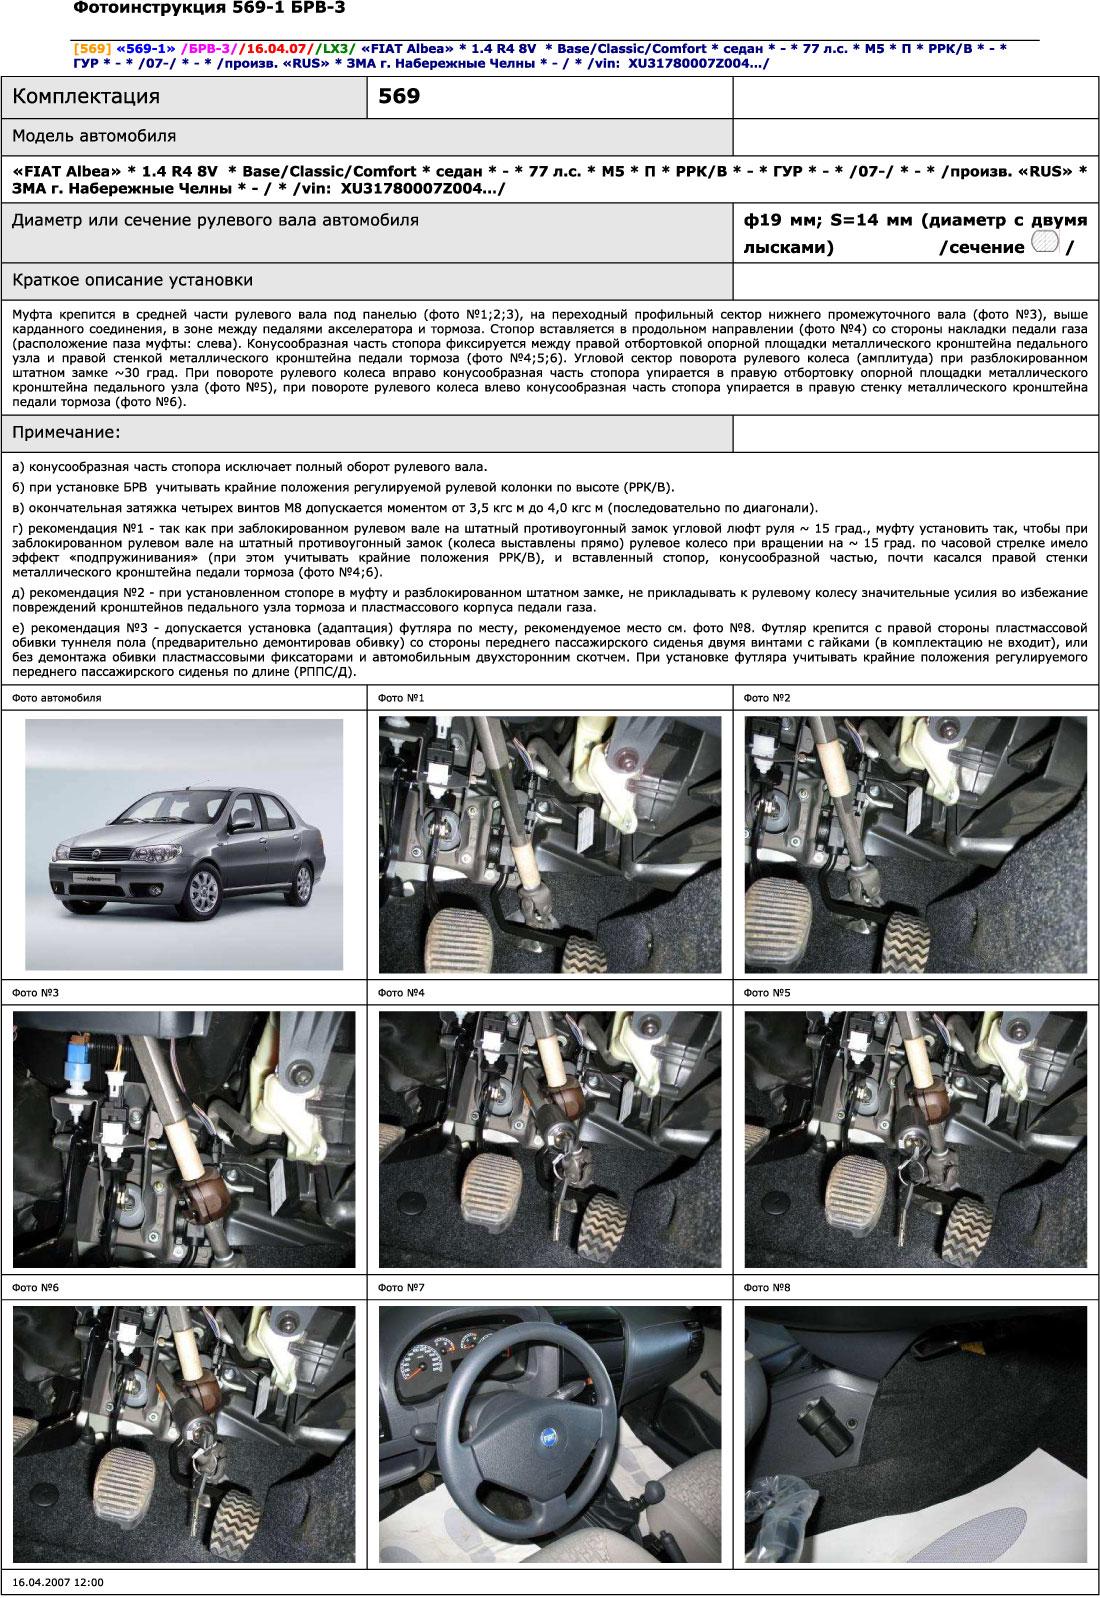 Блокиратор рулевого вала для FIAT ALBEA /2007-/ ГУР - Гарант Блок Люкс 569.E